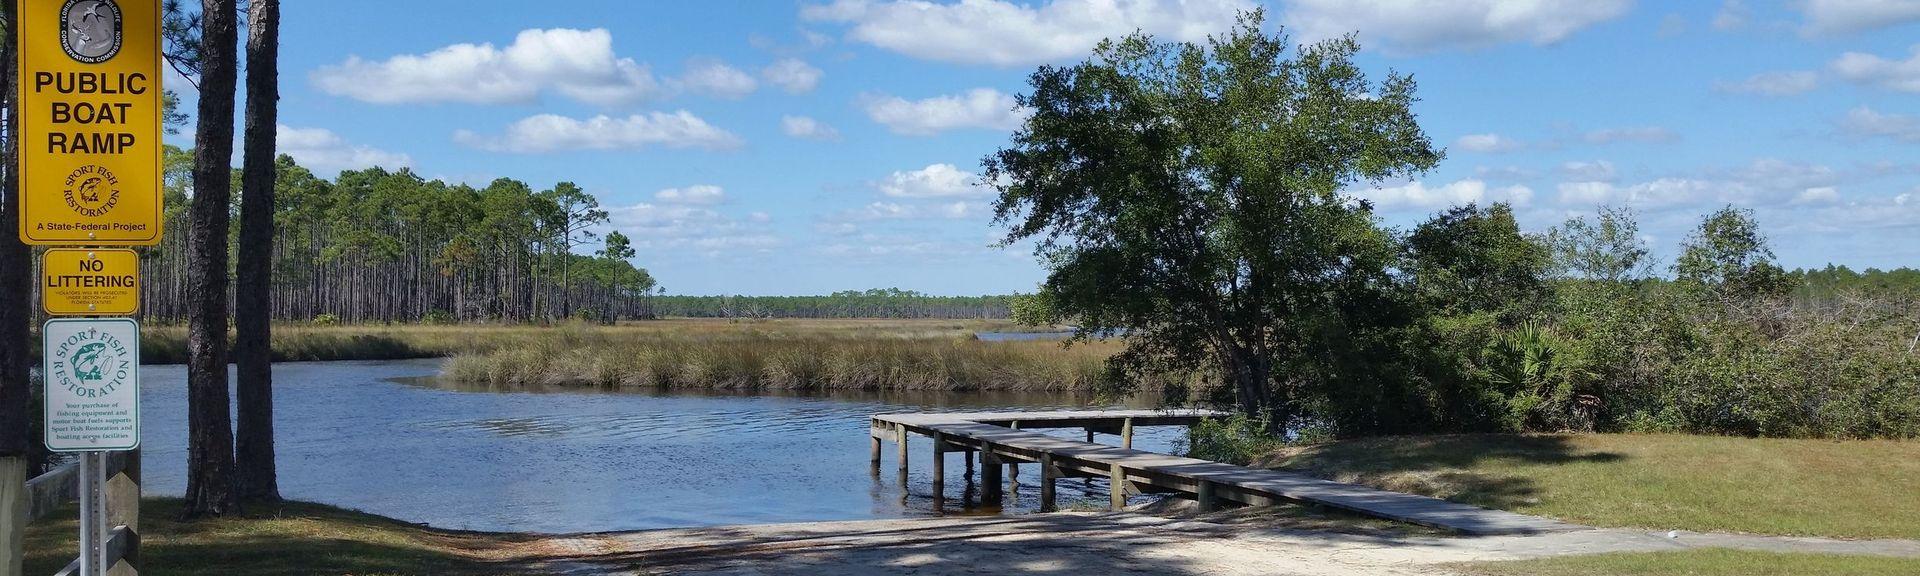 Eastpoint, Florida, United States of America